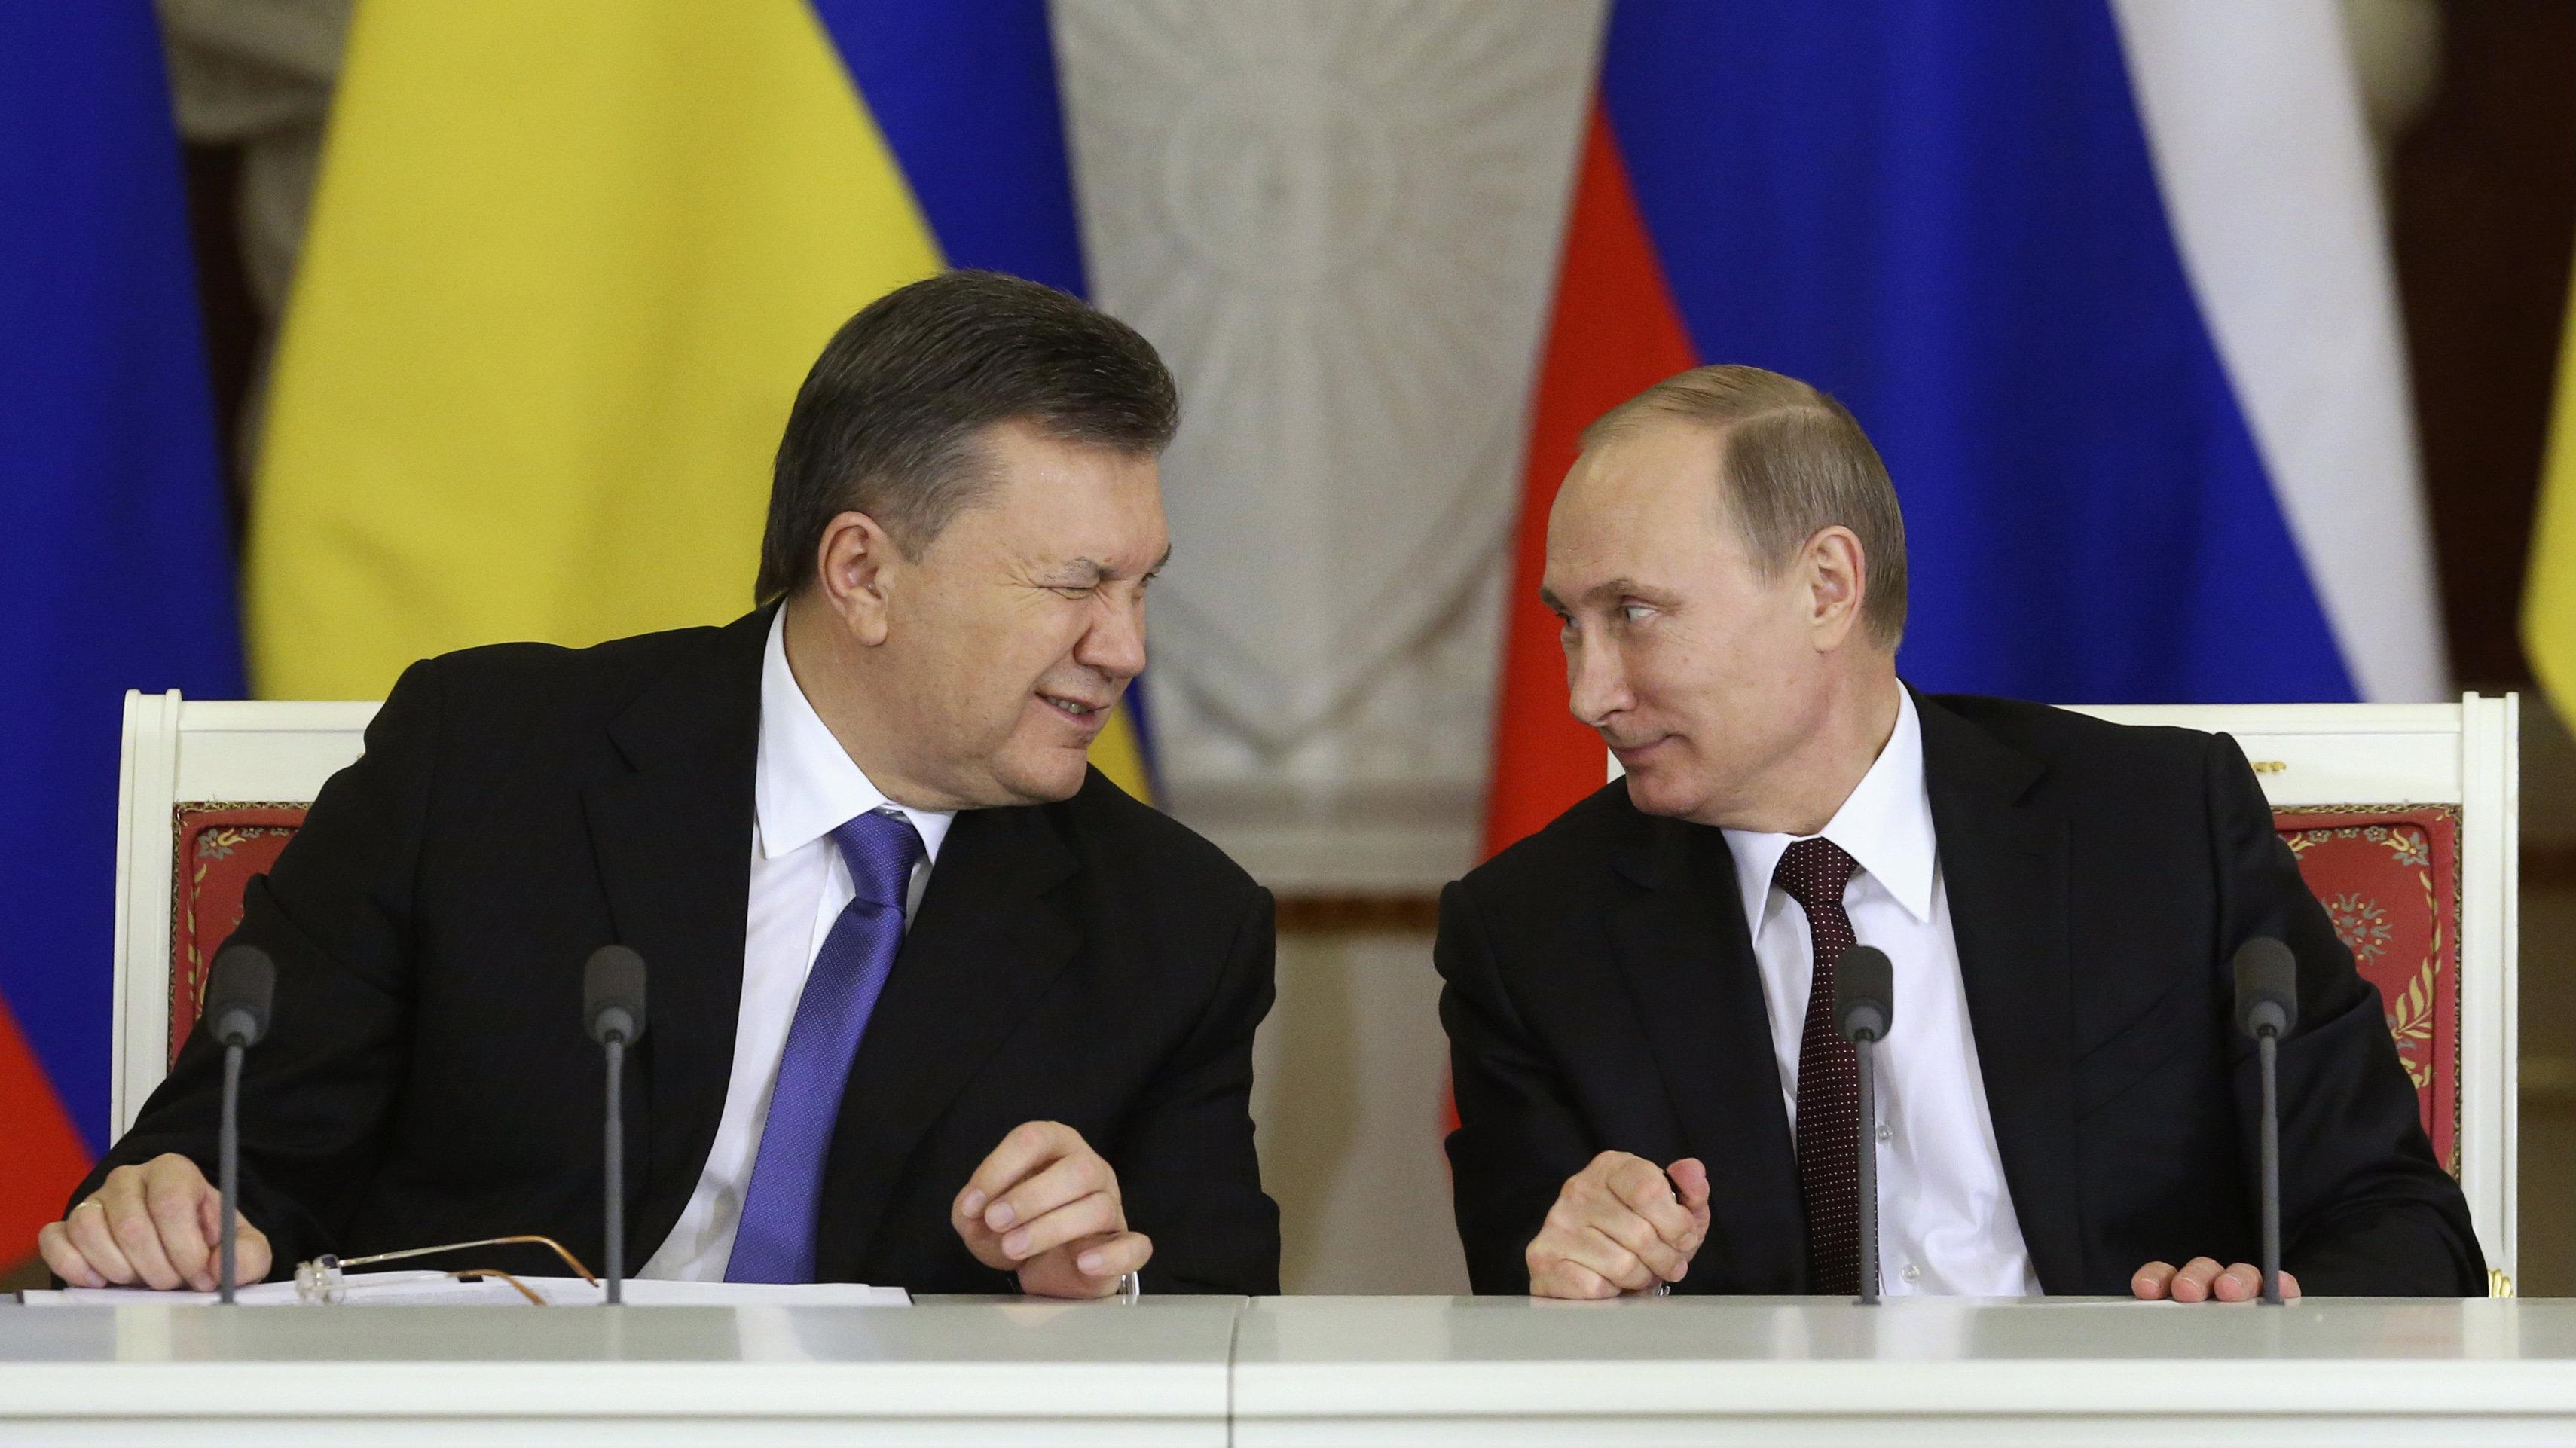 Chrystia Freeland: My Ukraine, and Putin's big lie — Quartz